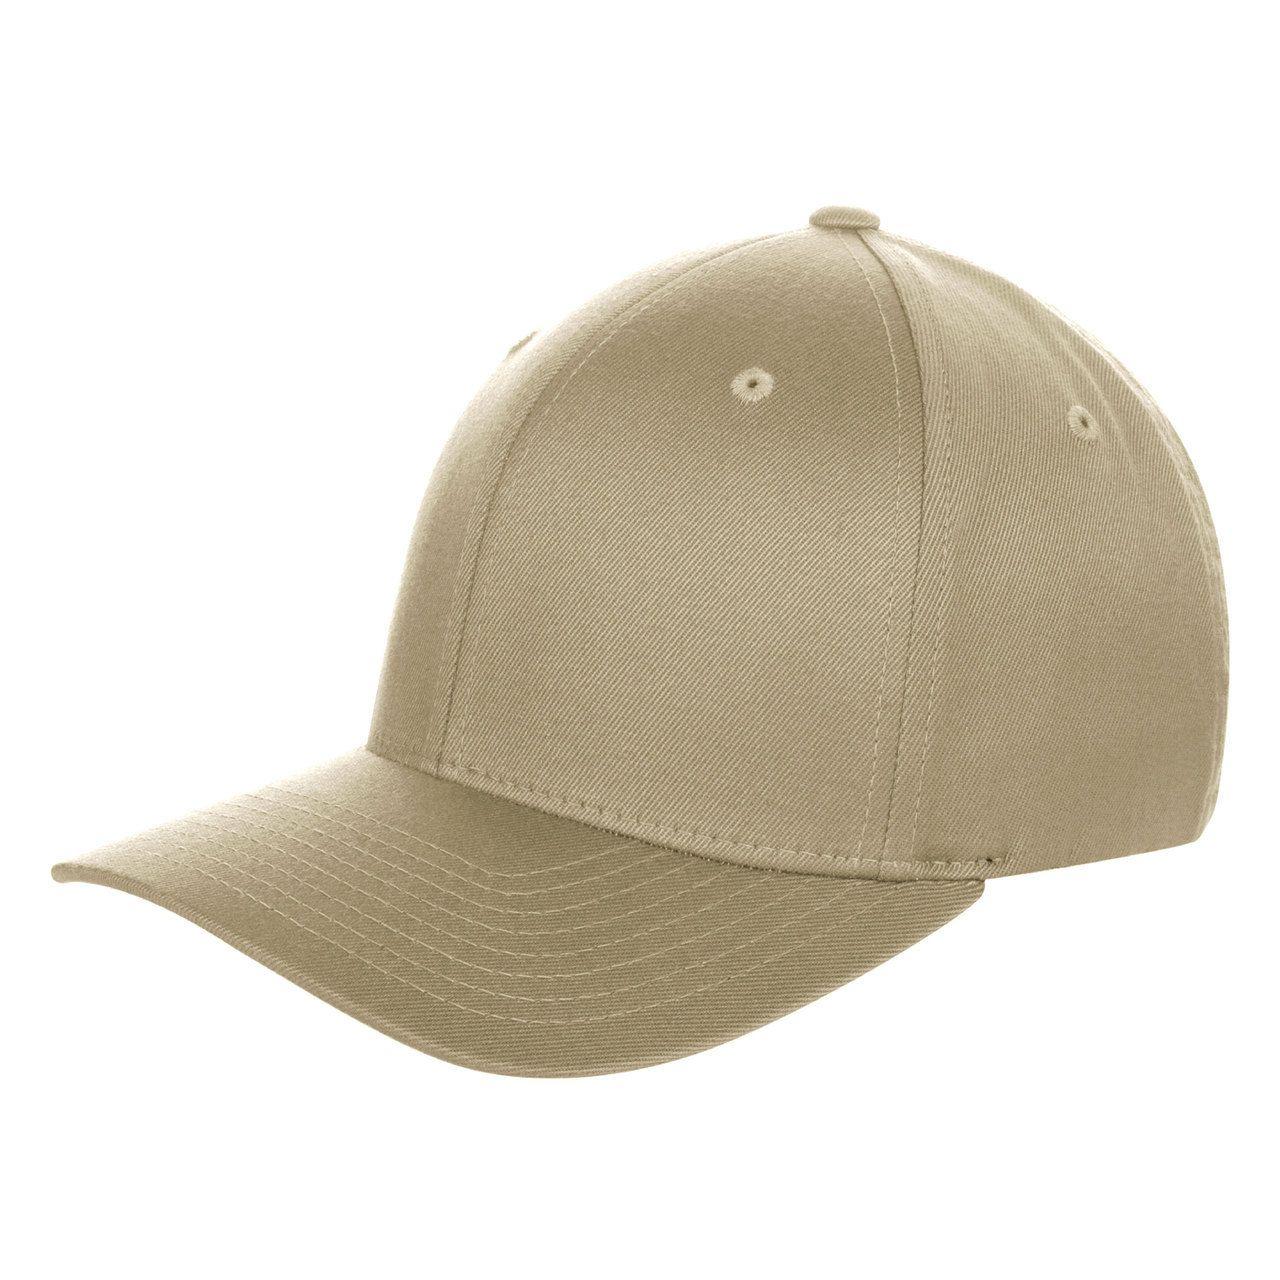 a58c0755bf9a5 Gents - The Director s Baseball Cap - Khaki